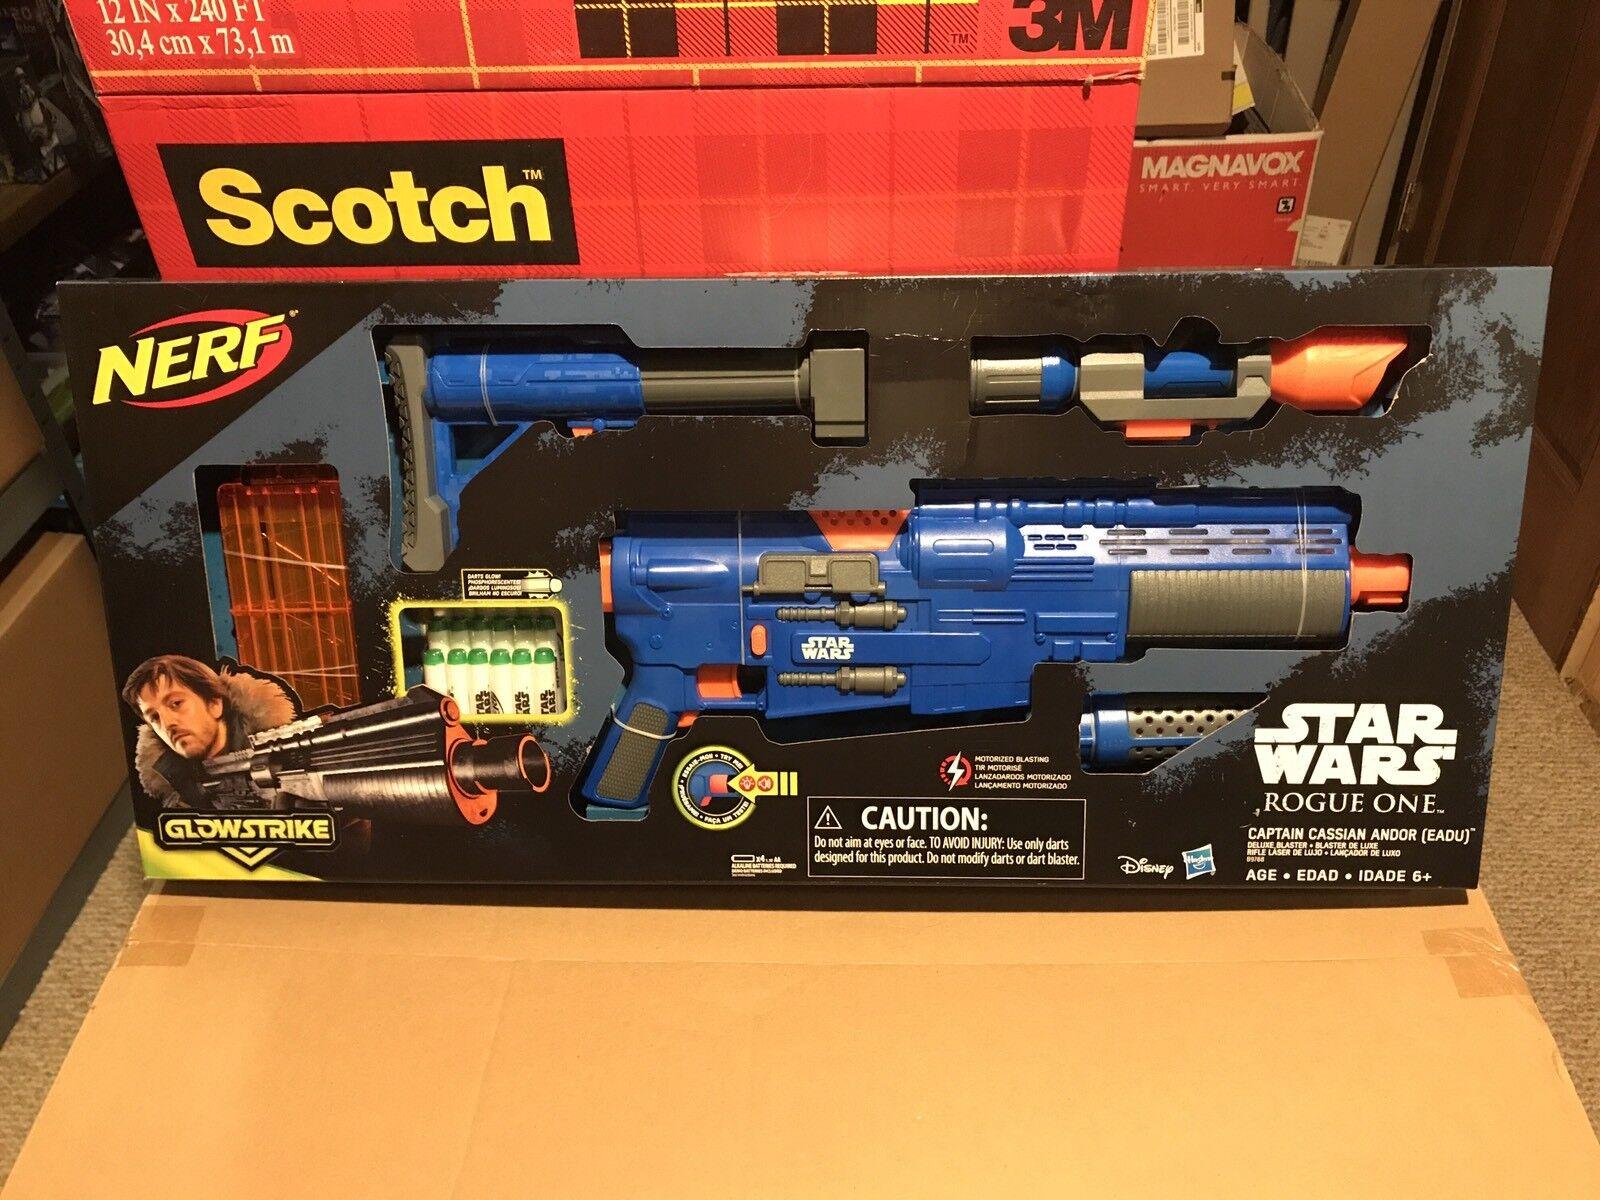 Star Wars ROGUE ONE Target Captain Cassian Andor Eadu GlowStrike NERF Blaster